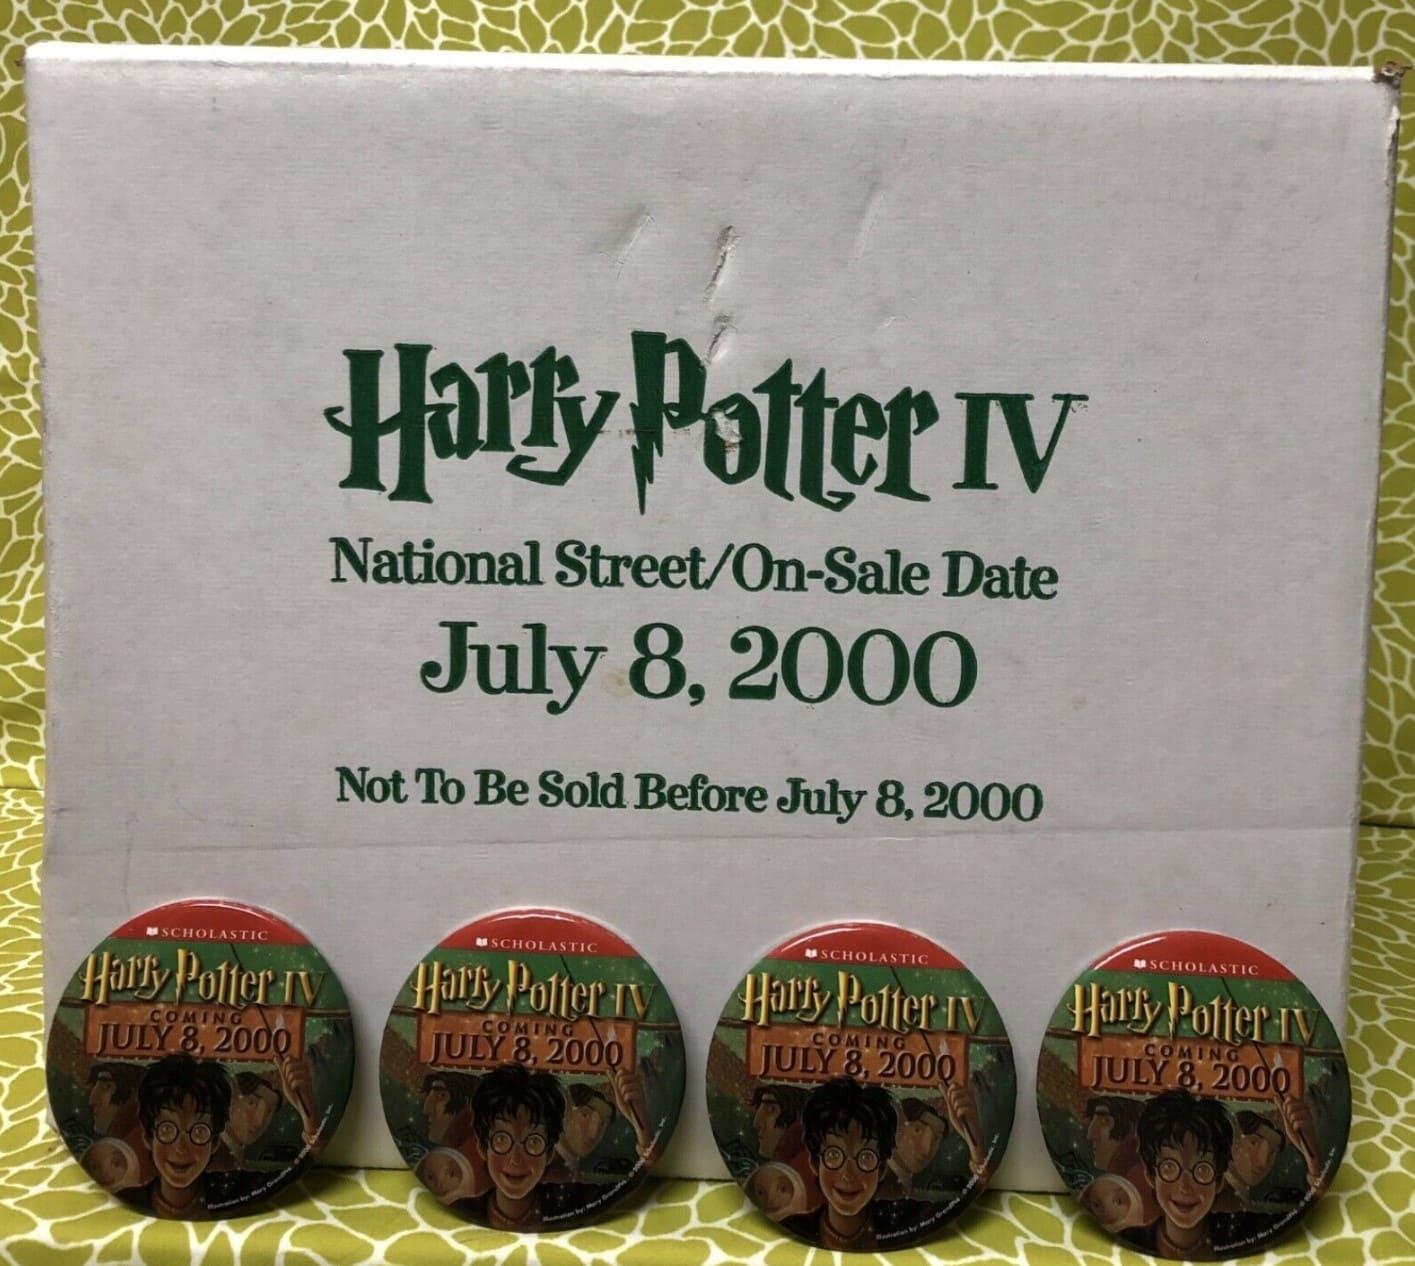 Harry Potter National Street-On-Sale Date July 8 2000